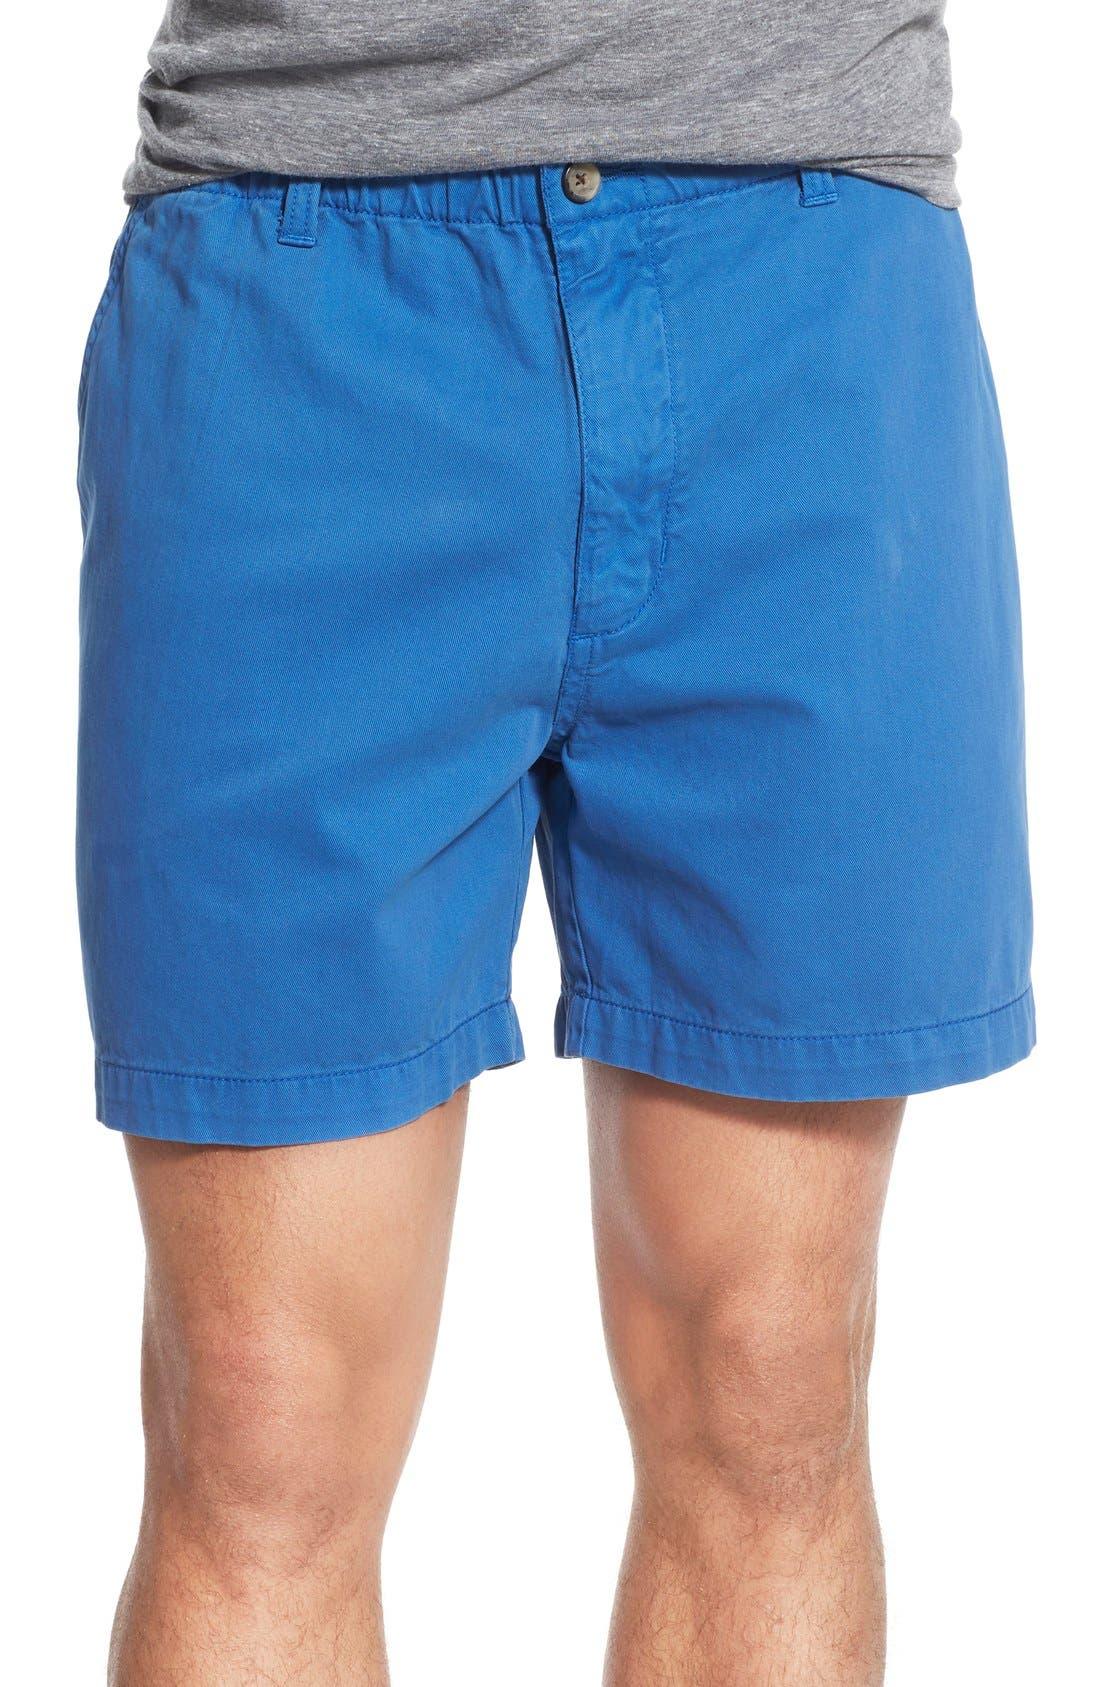 Alternate Image 1 Selected - Vintage 1946 'Snappers' Vintage Washed Elastic Waistband Shorts